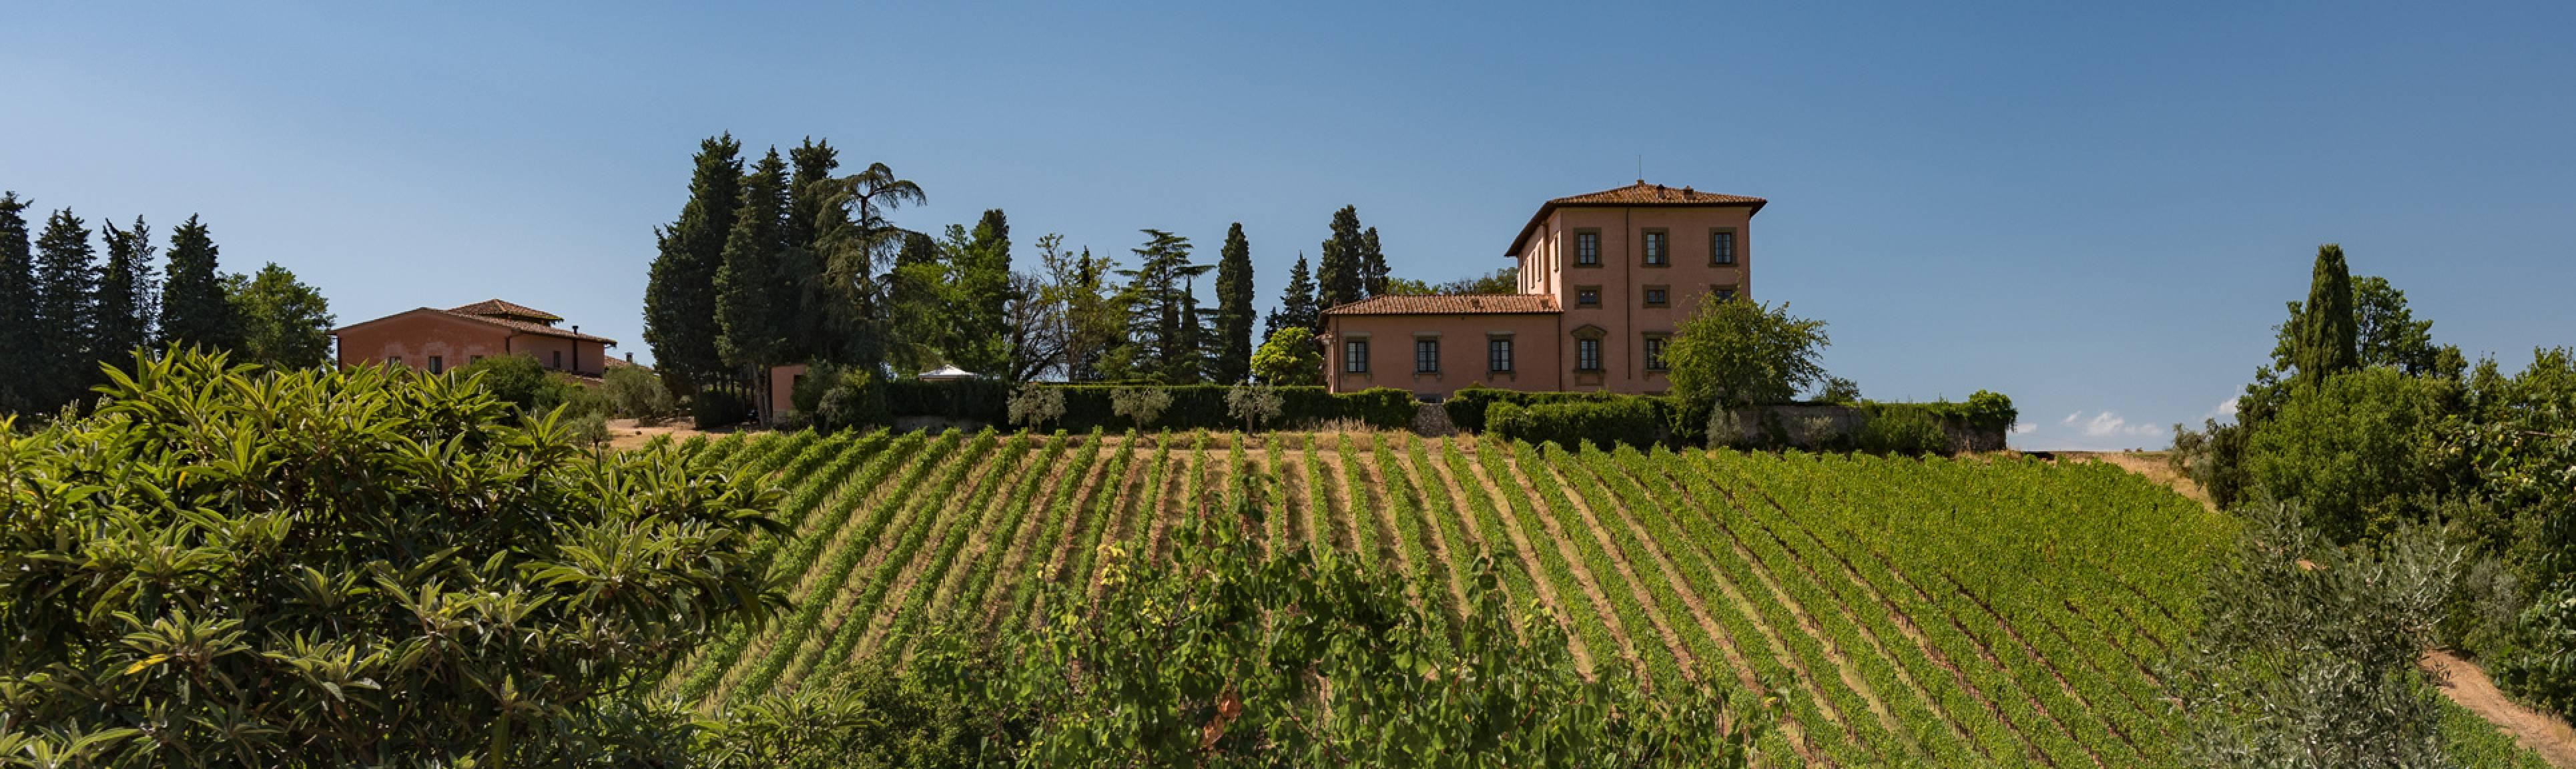 View of Tuscan Villa overlooking vineyards